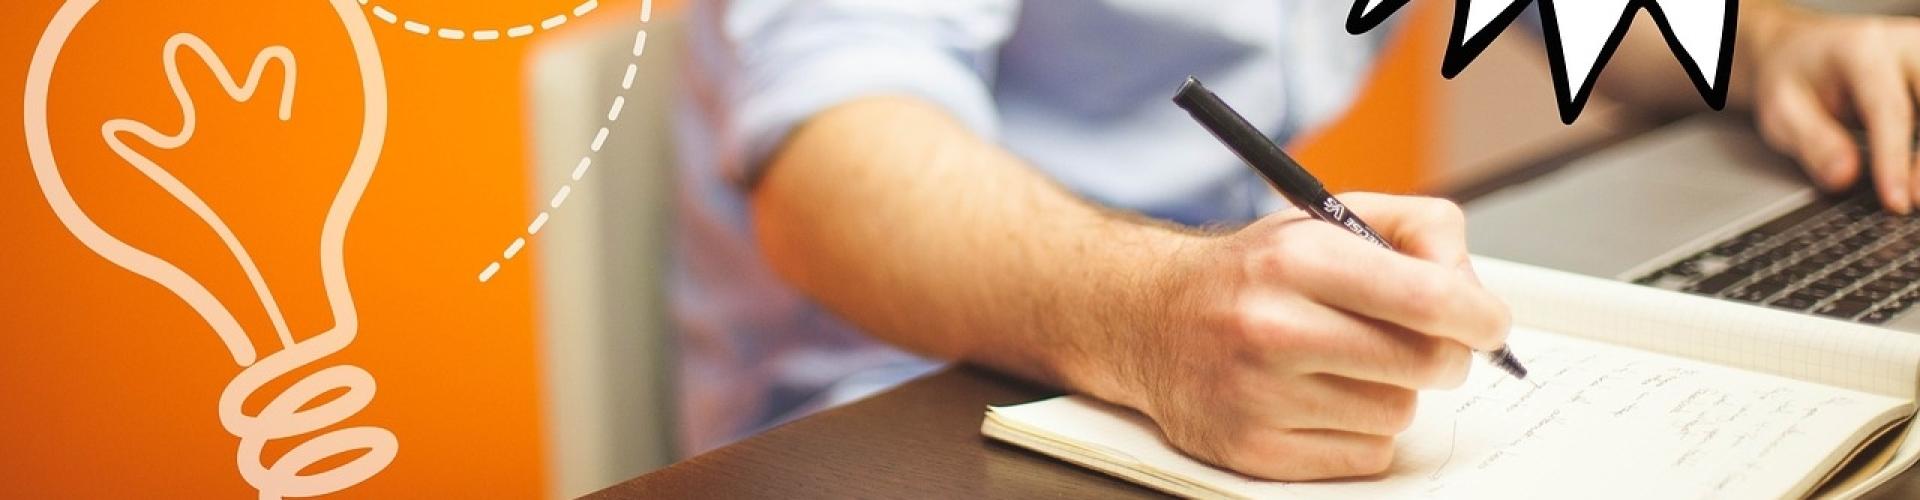 Online training webteksten schrijven